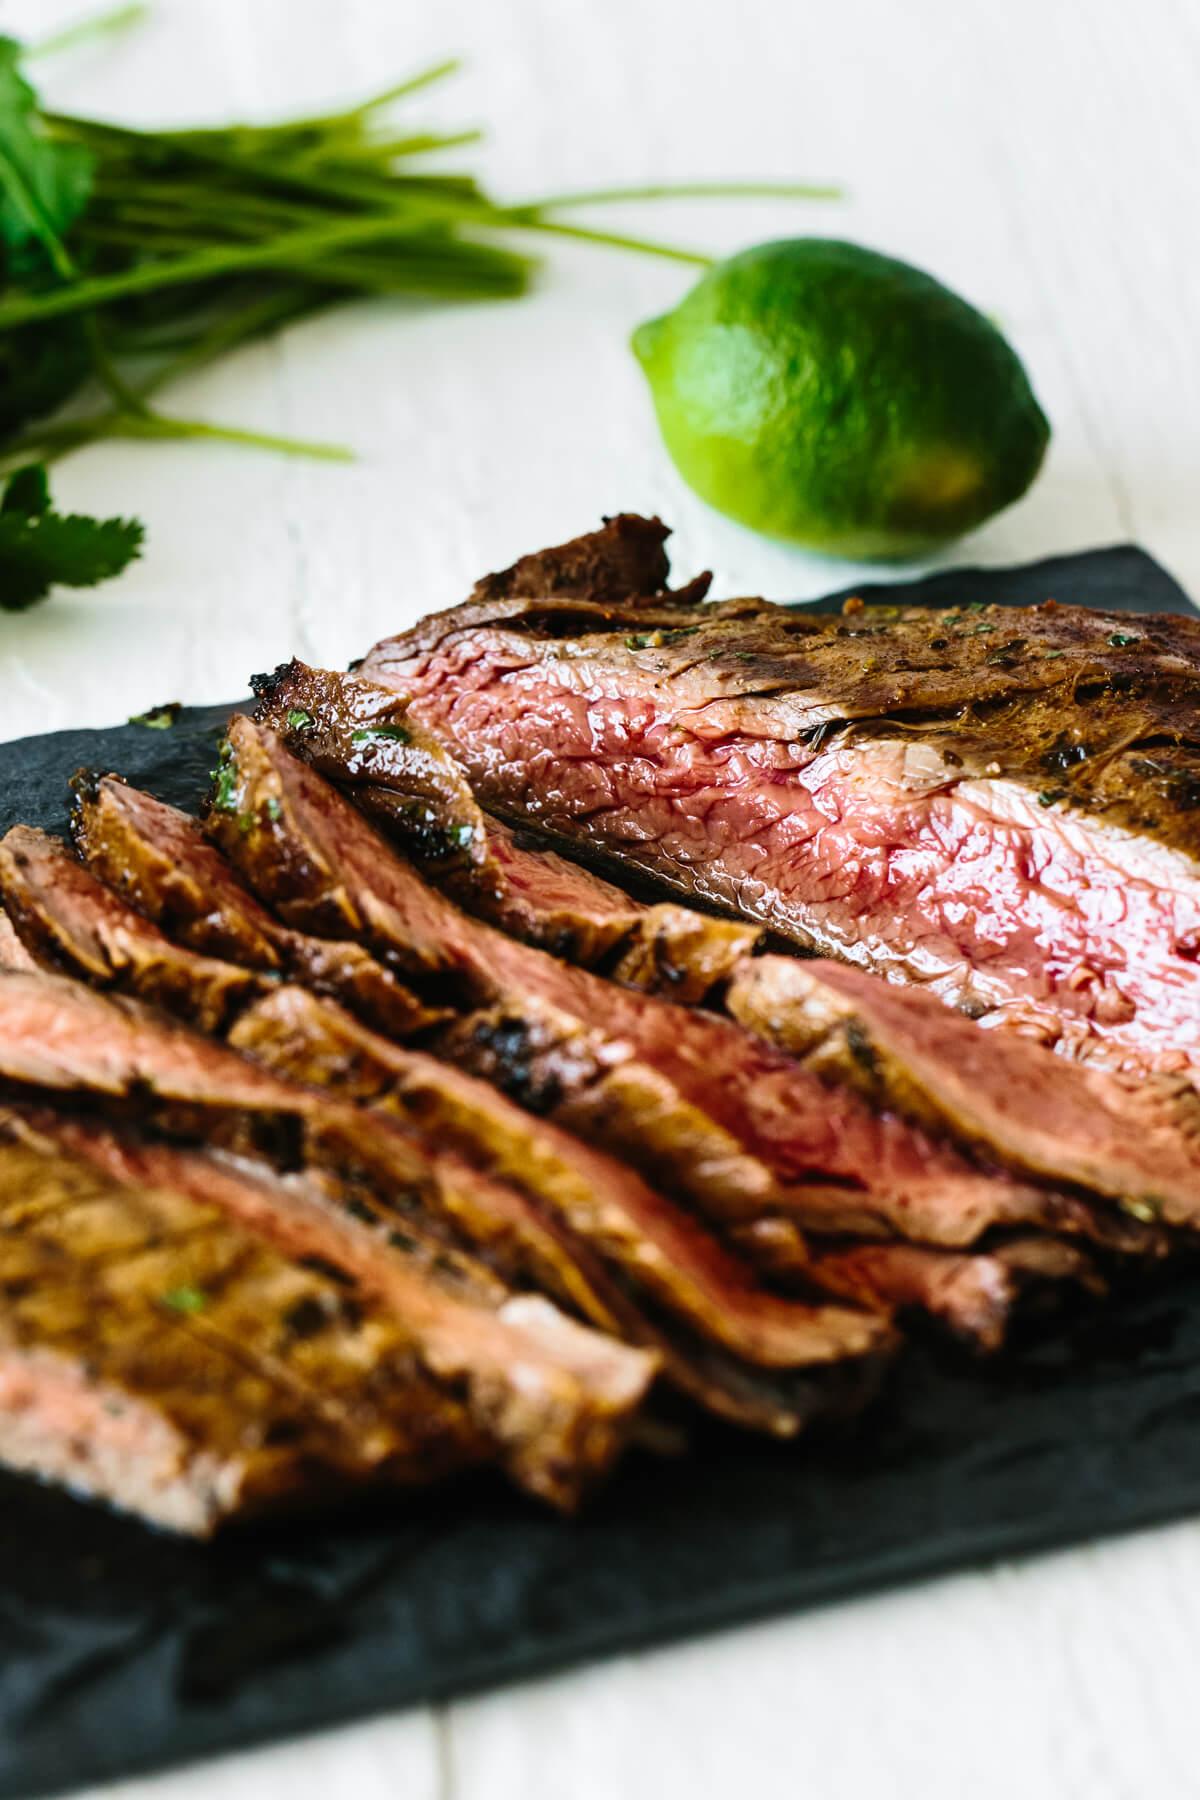 Carne asada sliced into thin strips.